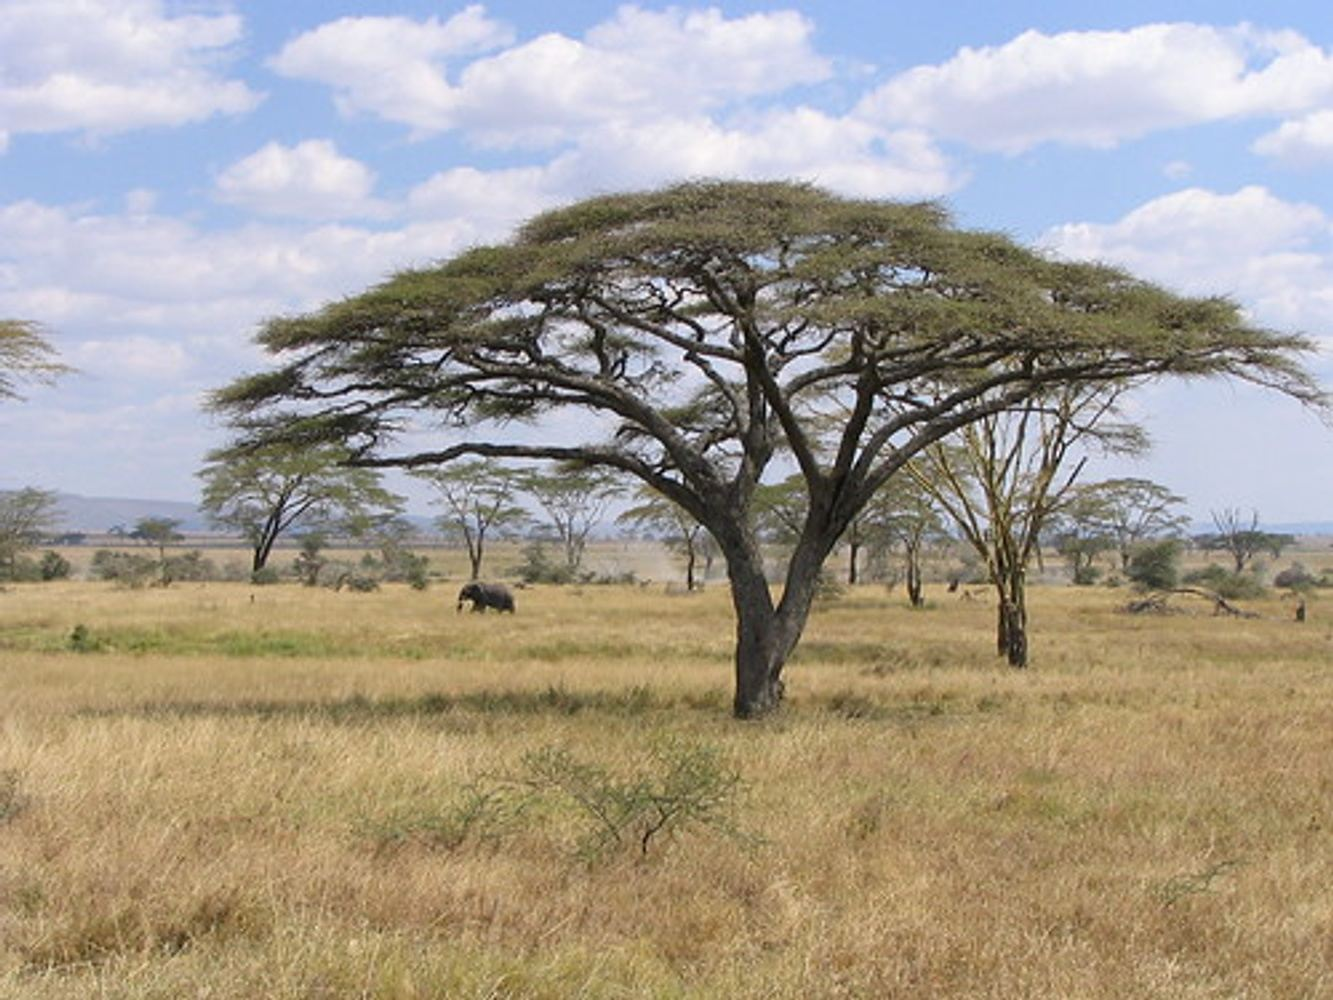 6 DAYS GREAT TANZANIA NORTHERN-SERENGETI MIGRATION